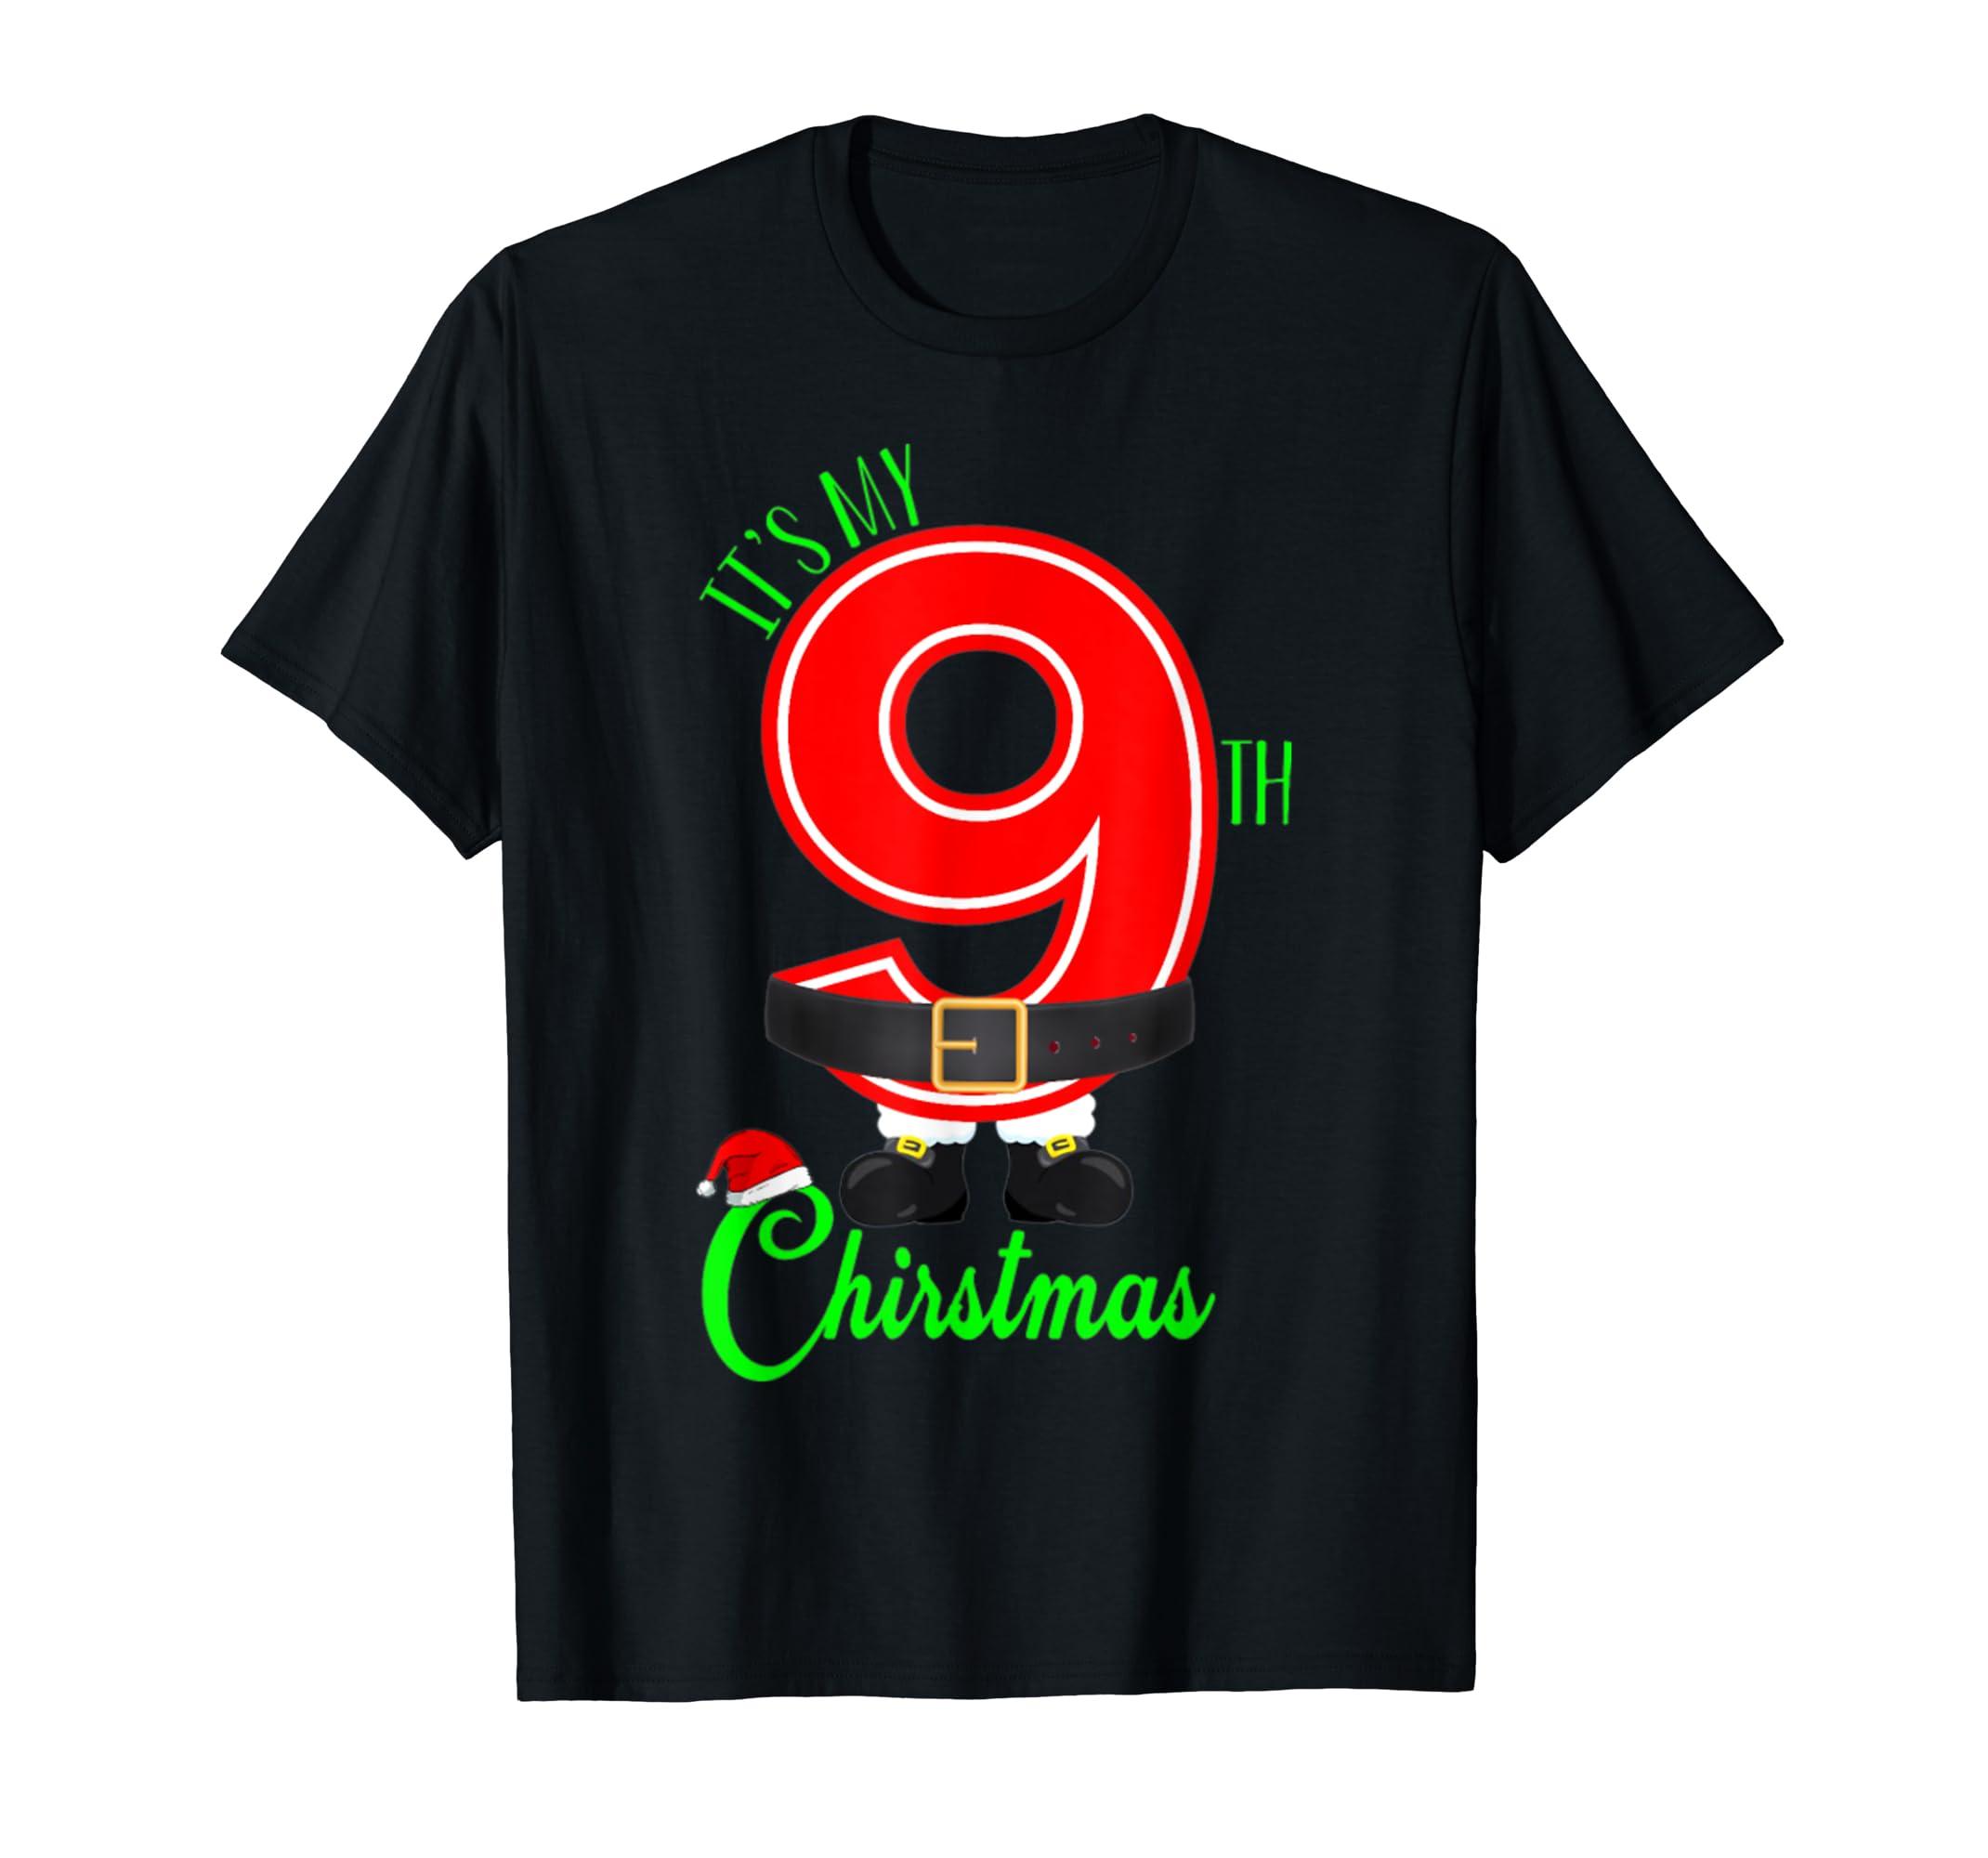 9th Christmas Birthday Shirt Gift Christmas For Born 2010 T-Shirt-Men's T-Shirt-Black